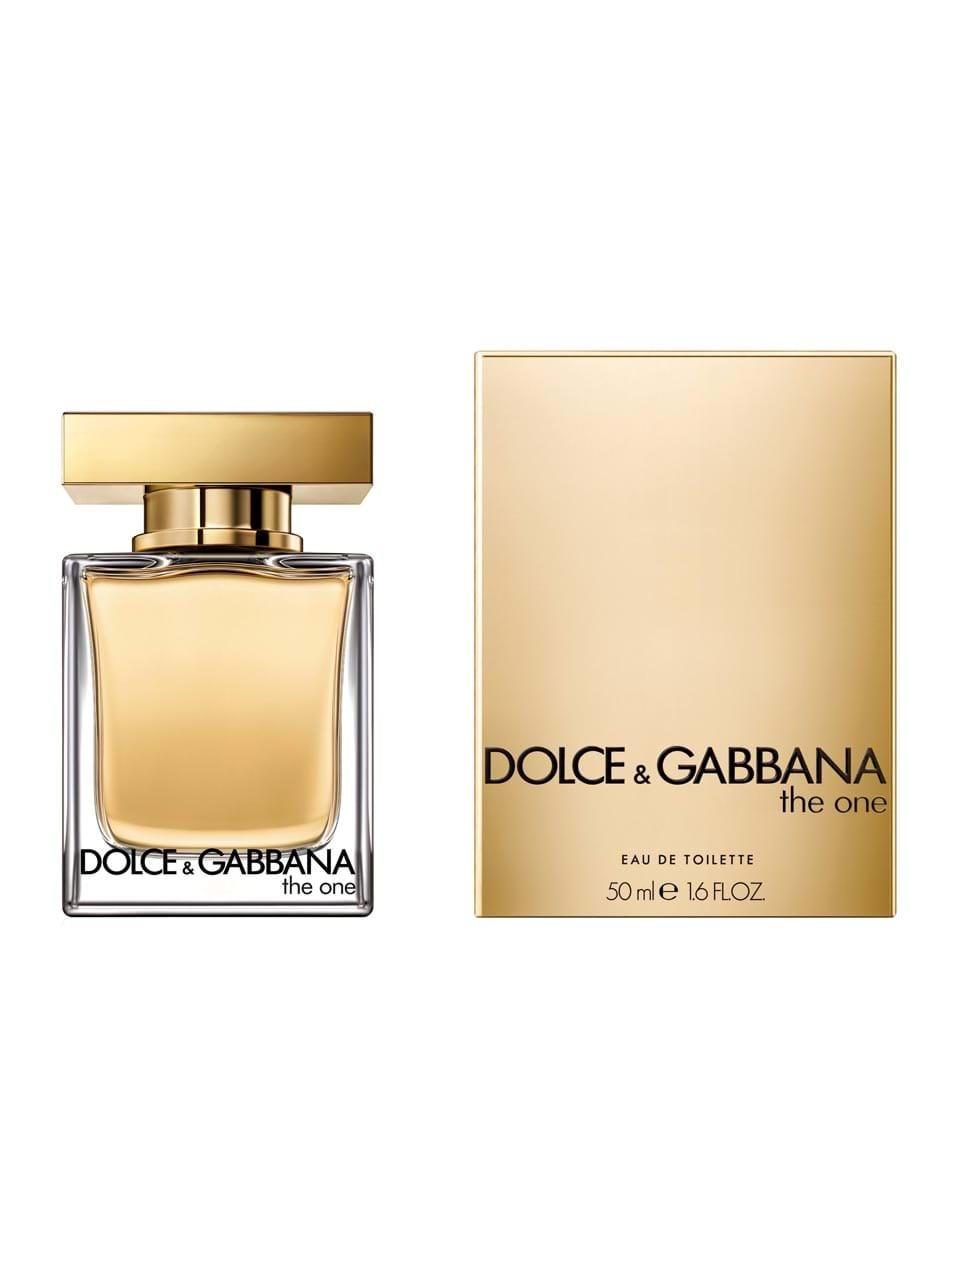 Gabbana 50 The One Ml Eau Toilette Dolceamp; De eHbWE2D9IY